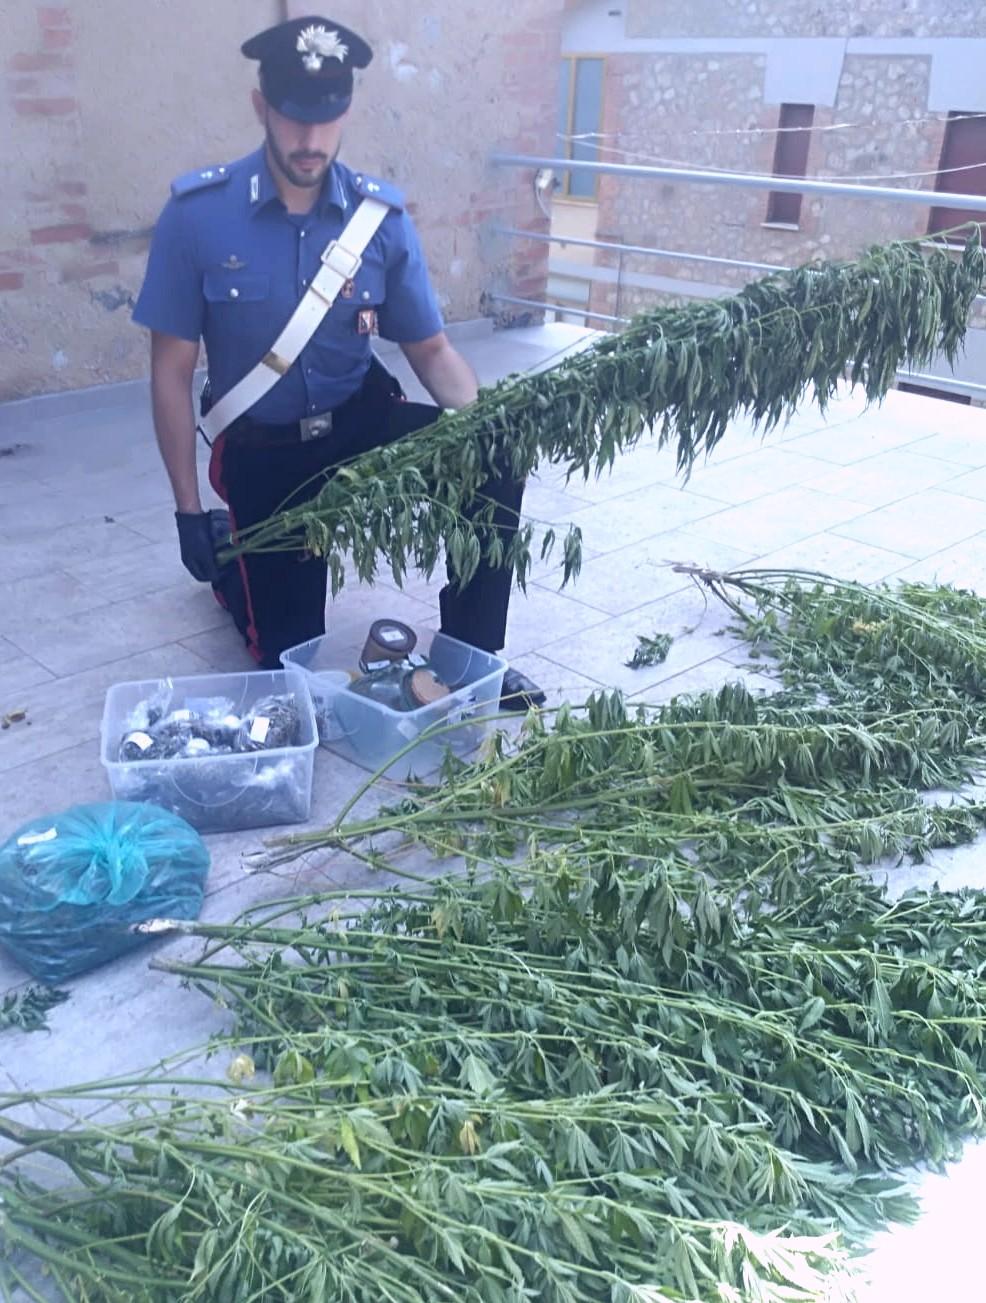 Coltiva marijuana in area boschiva. Arrestato 49enne